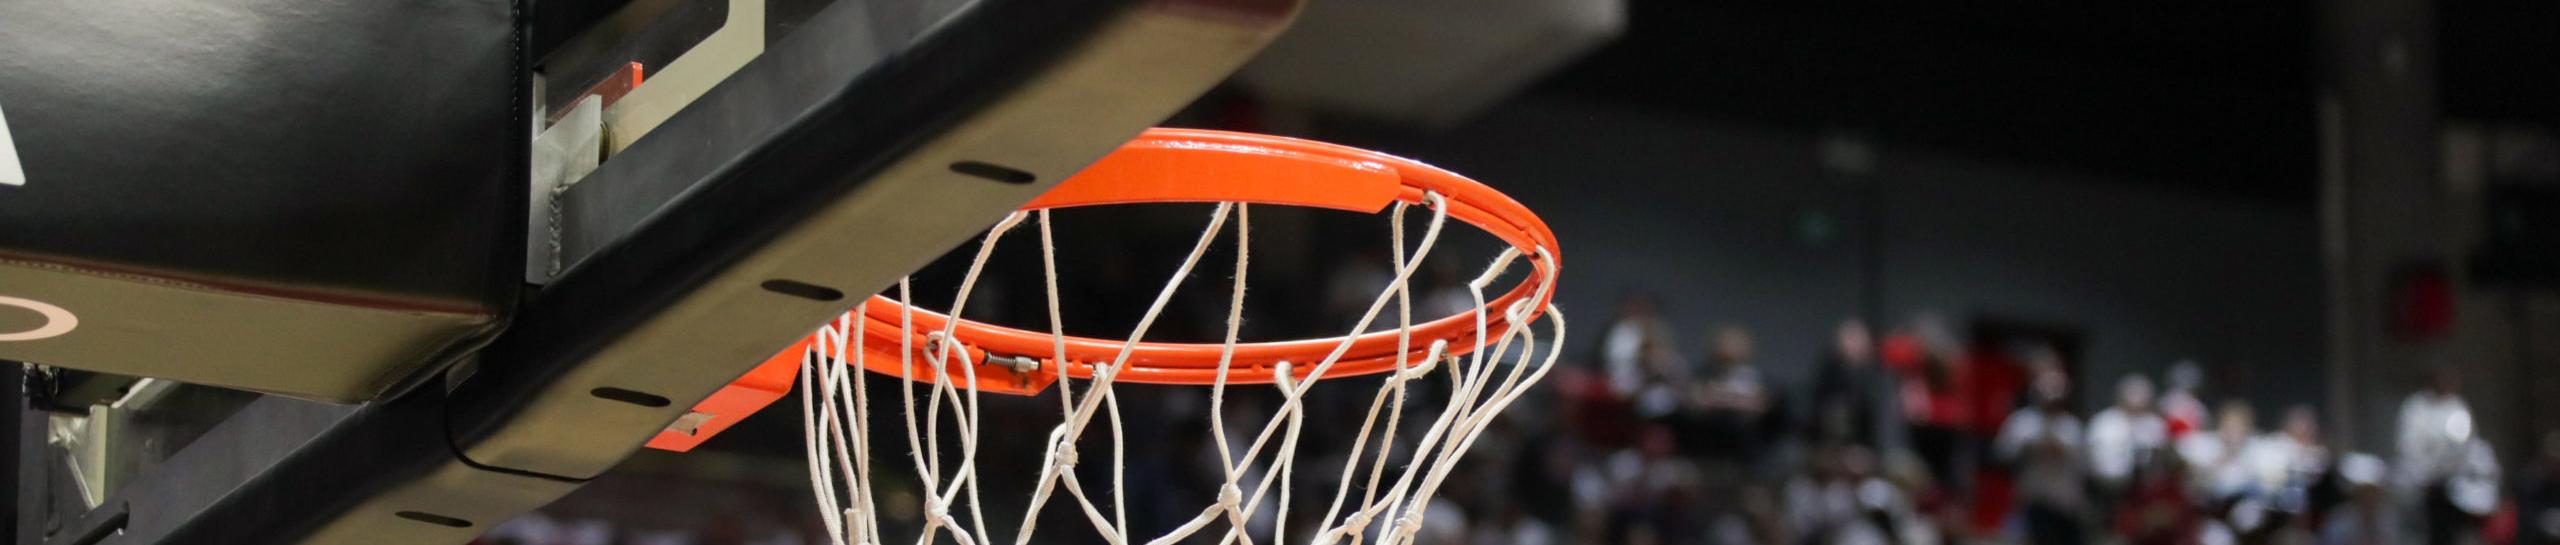 Eventi sportivi di oggi 30 aprile: semifinali di calcio in Nicaragua, finale per il basket di Taiwan